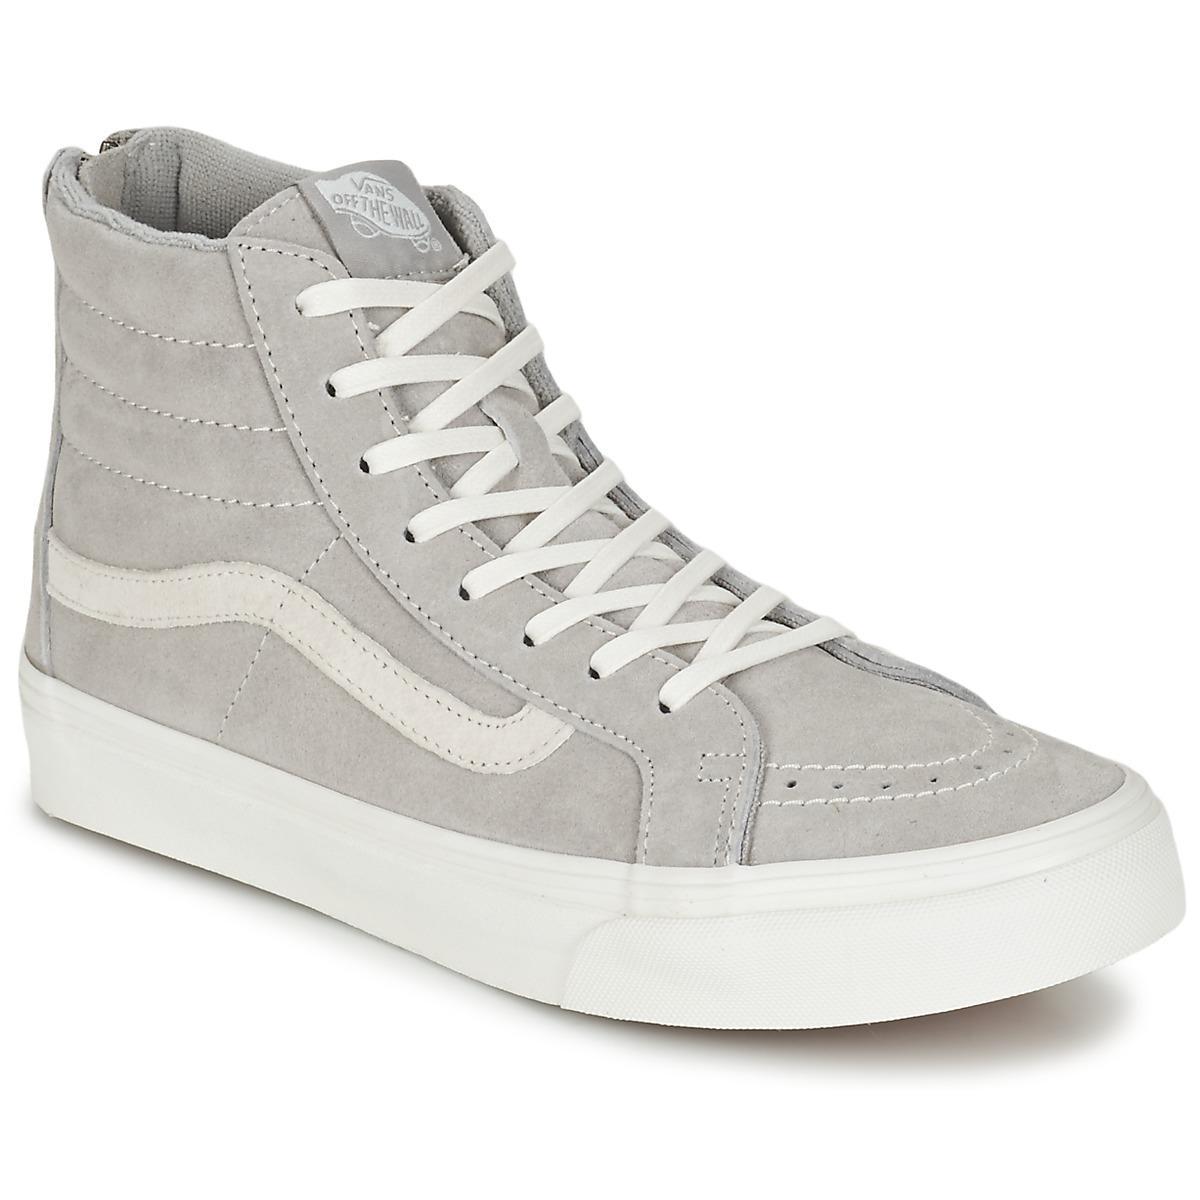 d6cfd71040 Vans Sk8-hi Slim Zip Shoes (high-top Trainers) in Gray - Save ...